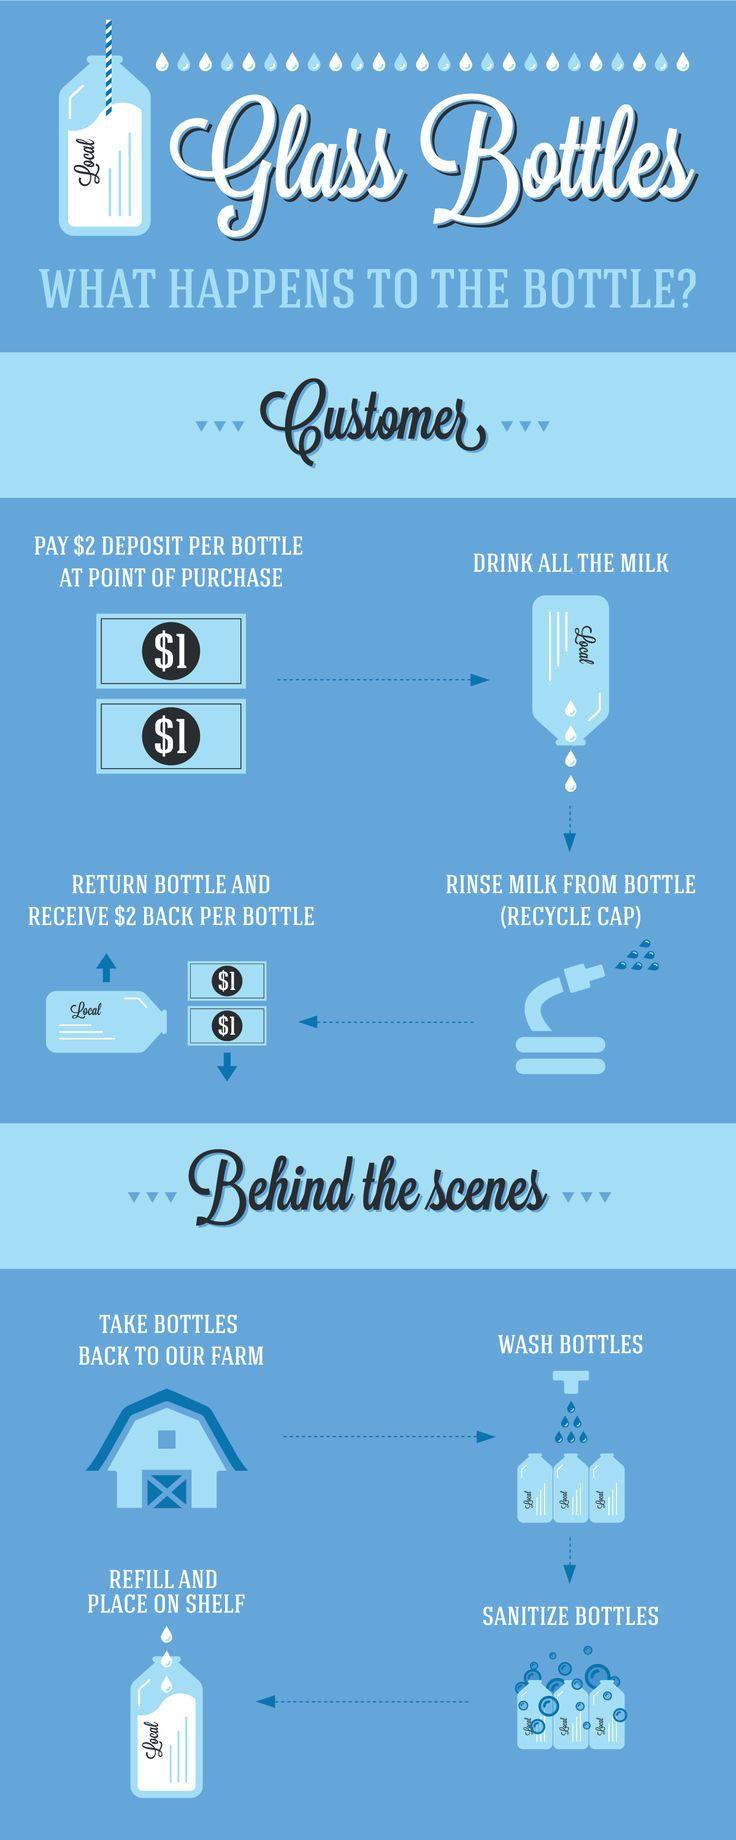 Danzeisen Dairy in Phoenix, Arizona explains how the milk bottle process works with this handy inforgraphic.   www.drinkmilkinglassbottles.com  #Dairy #Milk #Infographic #MilkBottle #MilkBottles